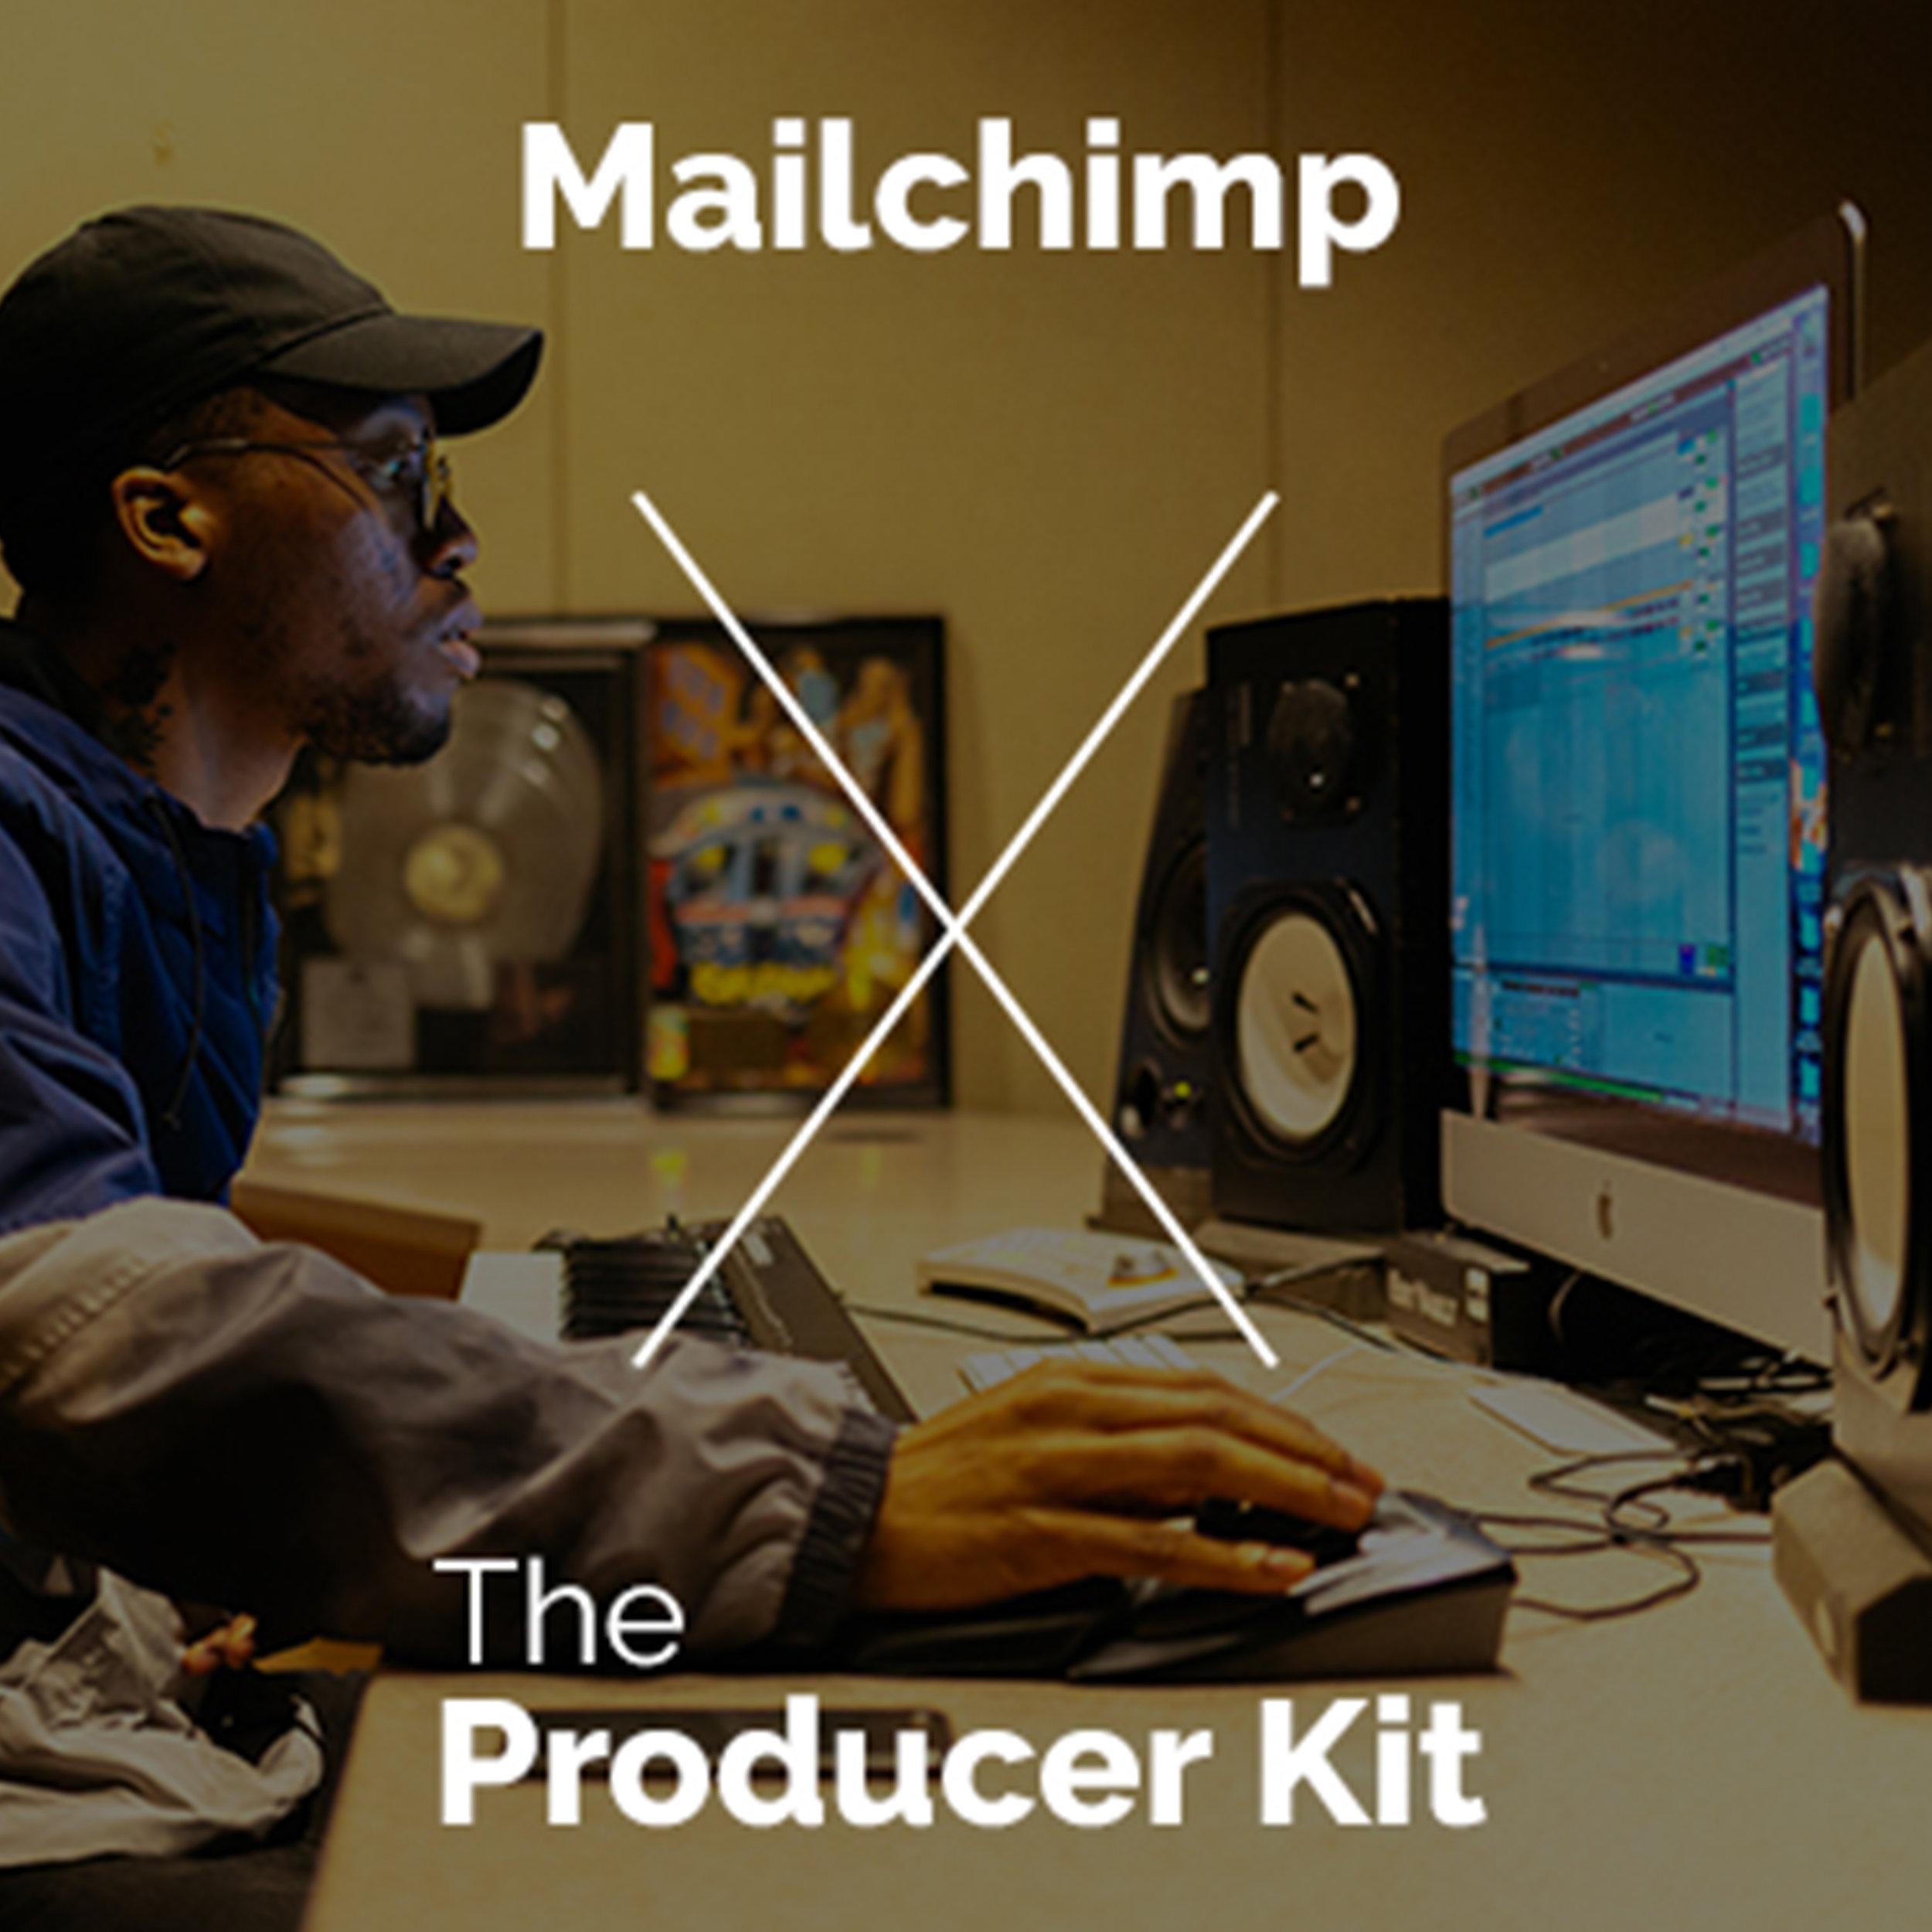 MAILCHIMP X THE PRODUCER KIT